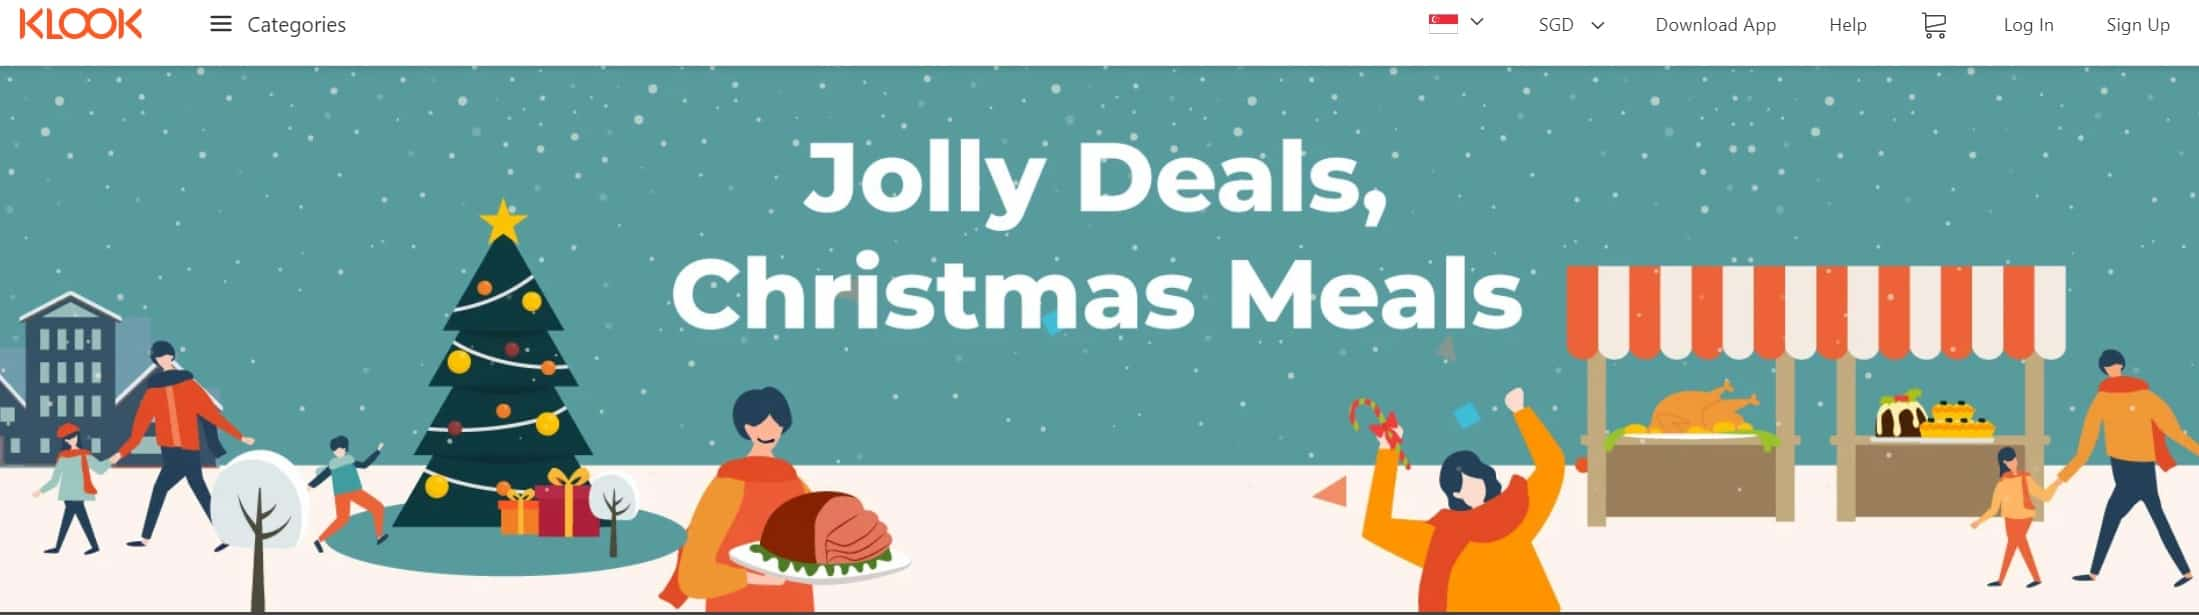 Klook Christmas Sale